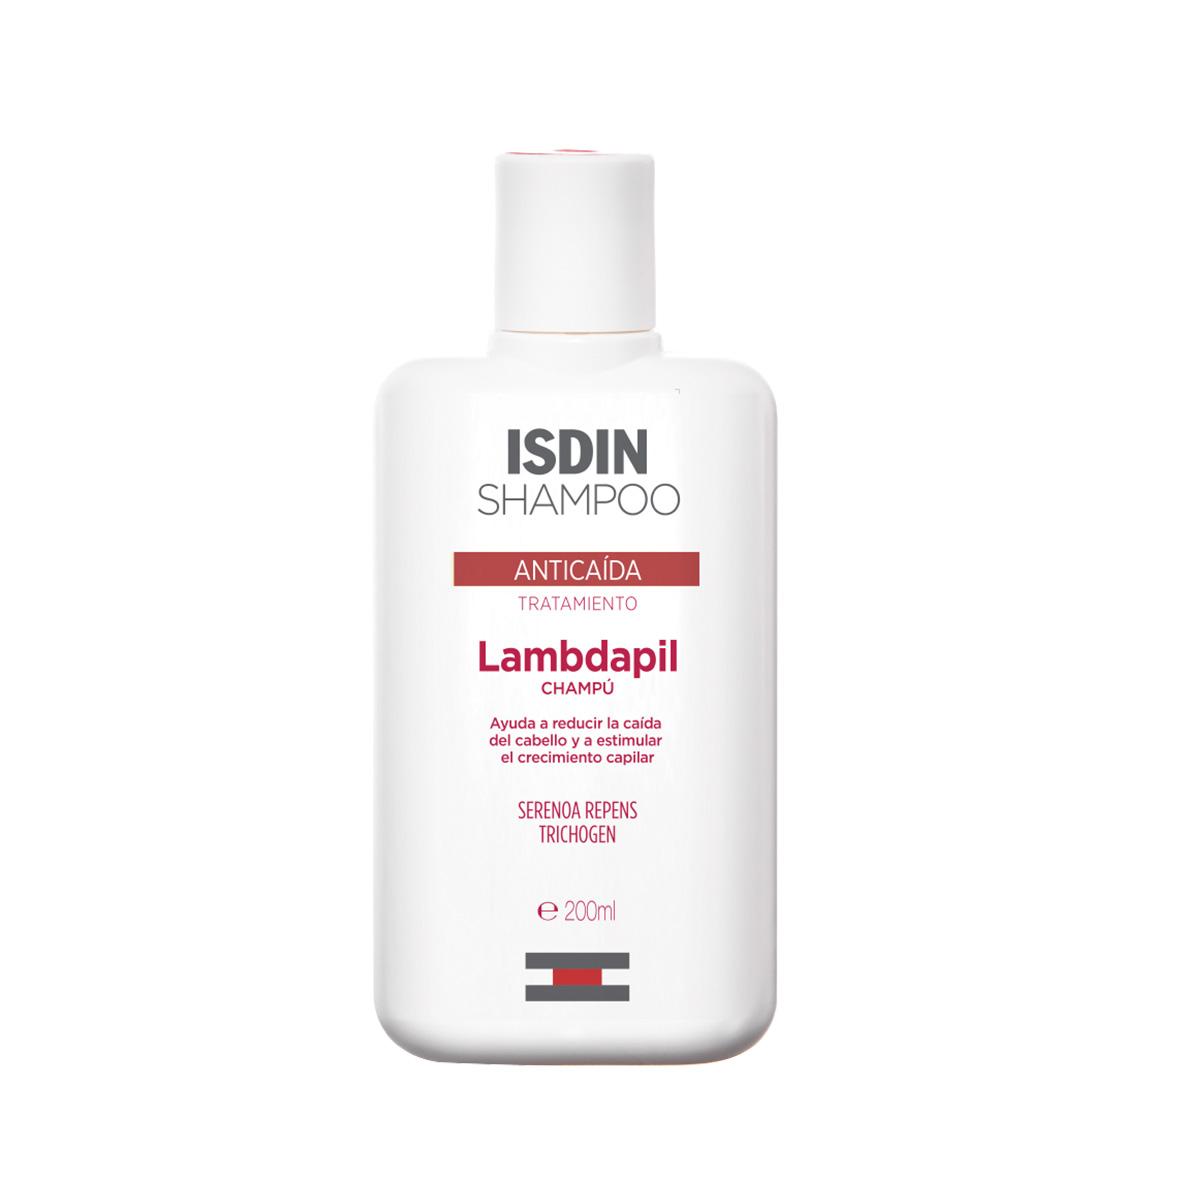 ISDIN Shampoo Lambdapil